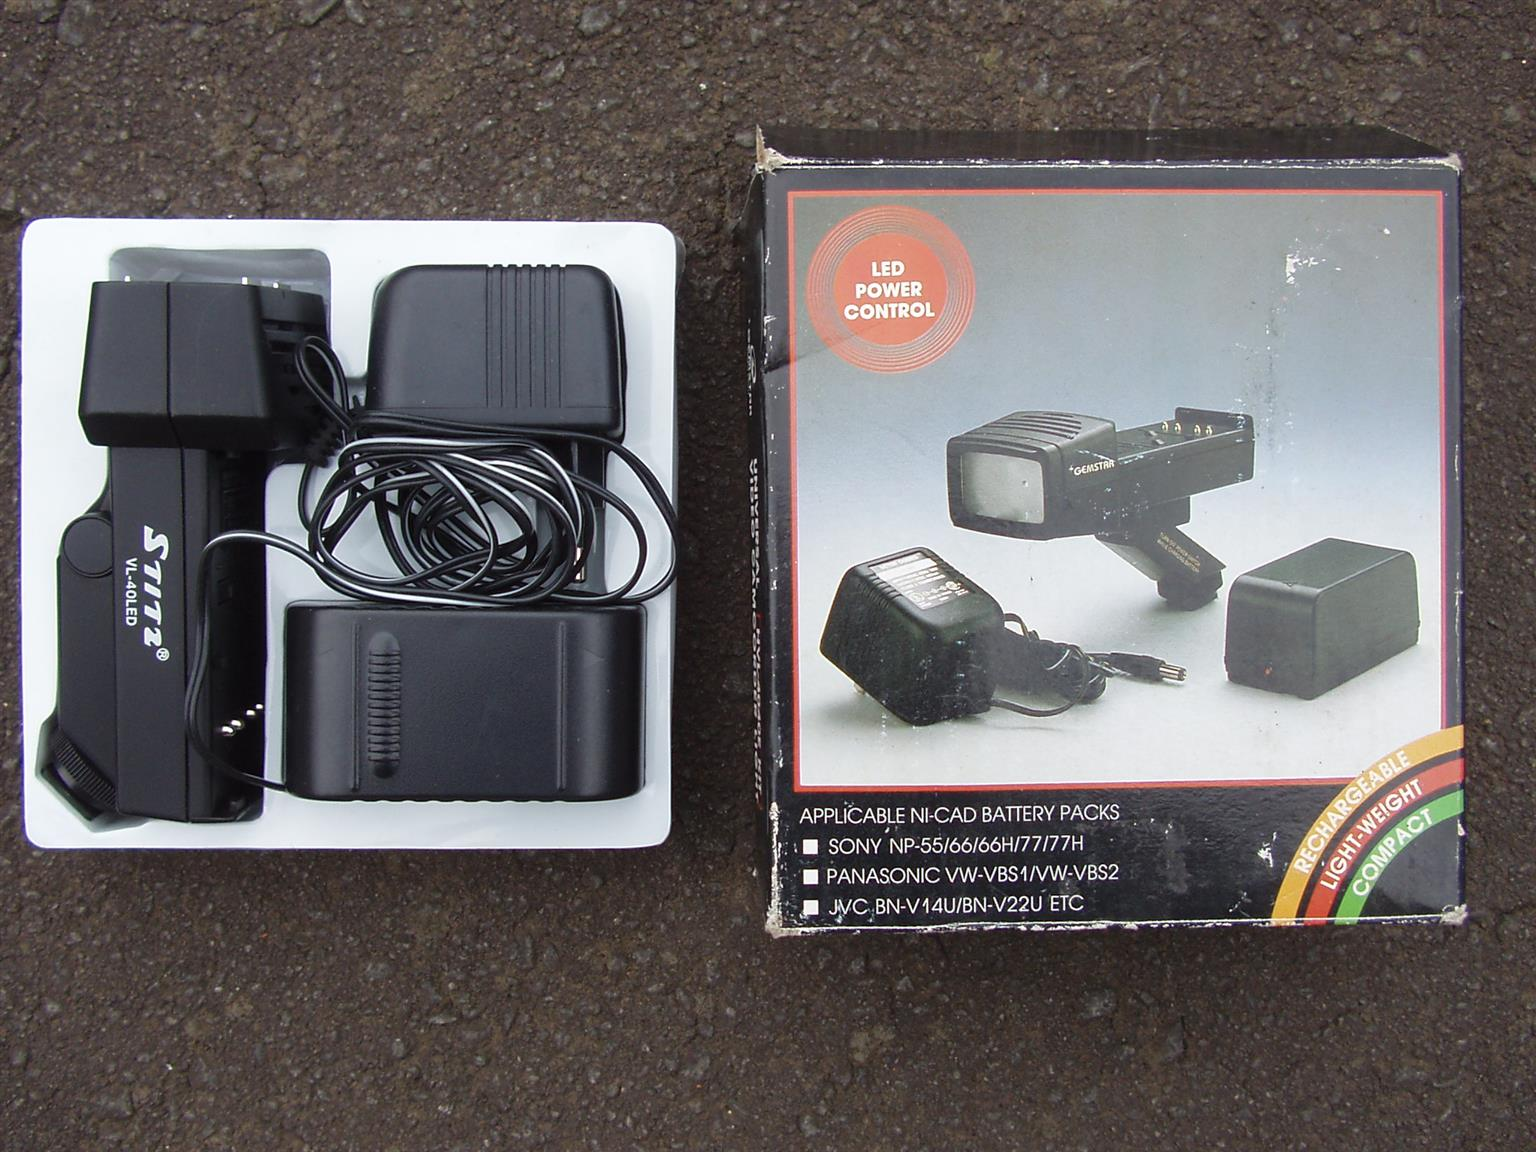 Video Camcorder Light - Gemstar - Universal - HVL-4040E Kit